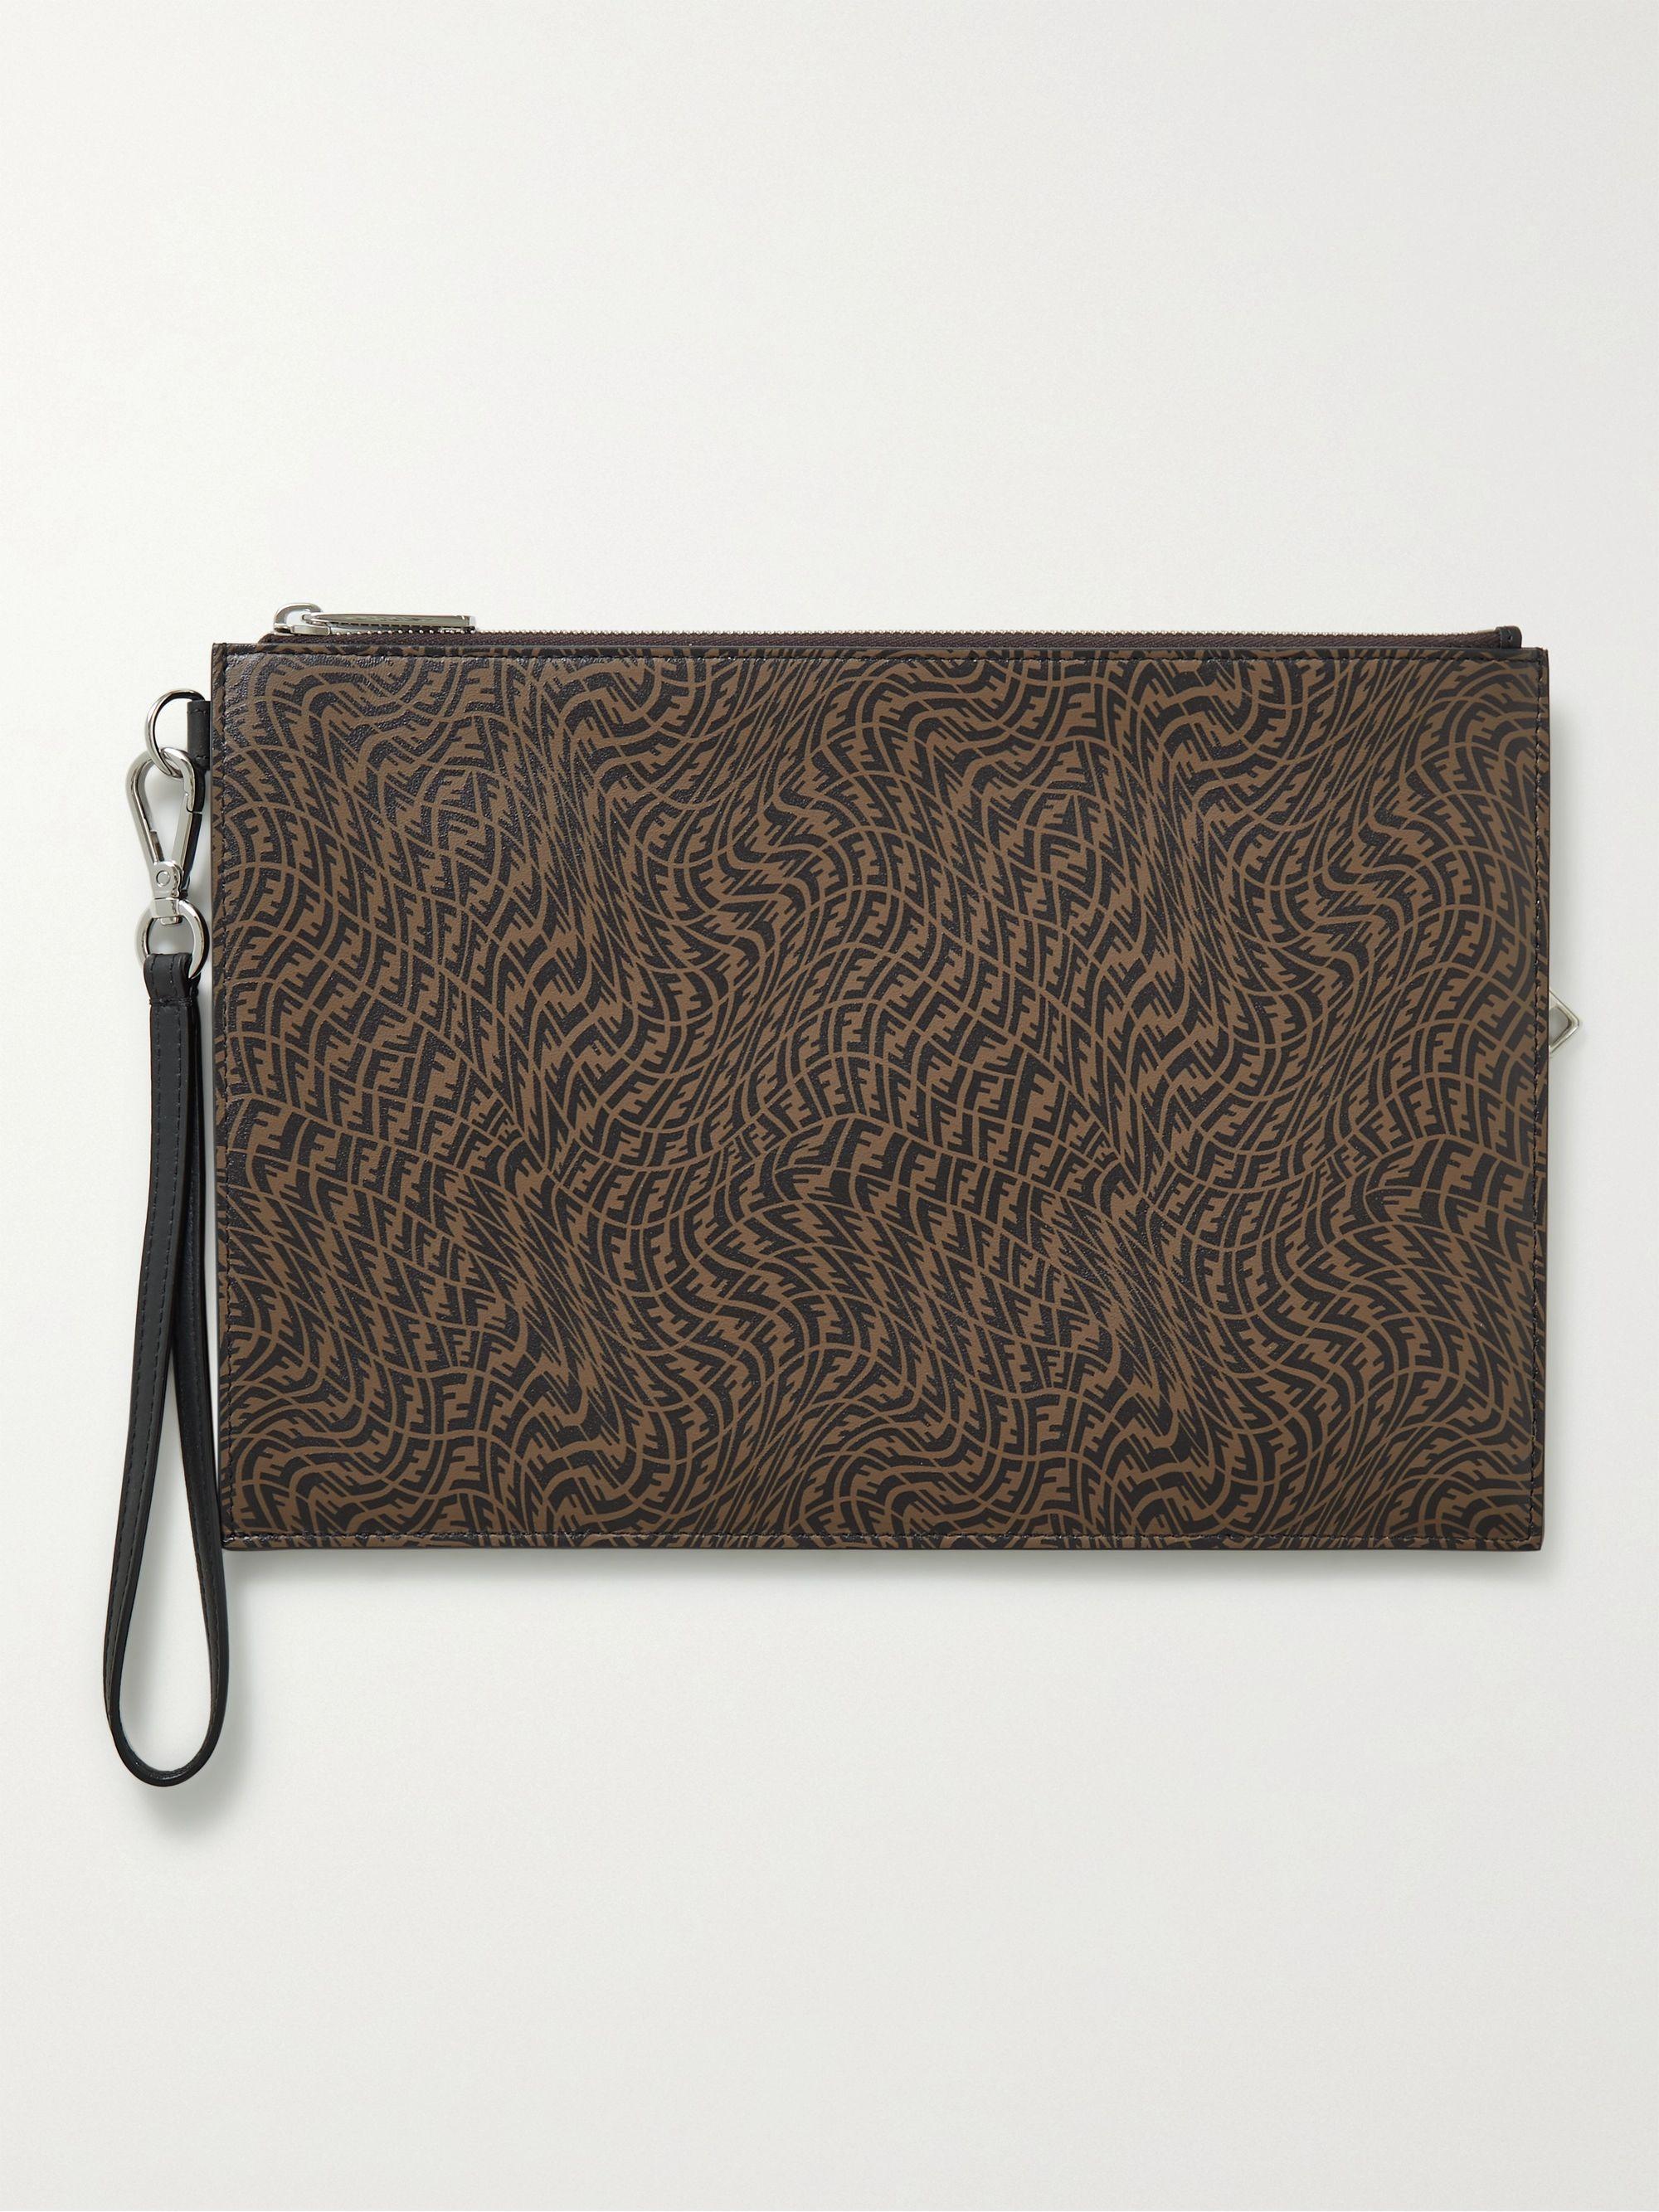 FENDI Logo-Print Textured-Leather Pouch